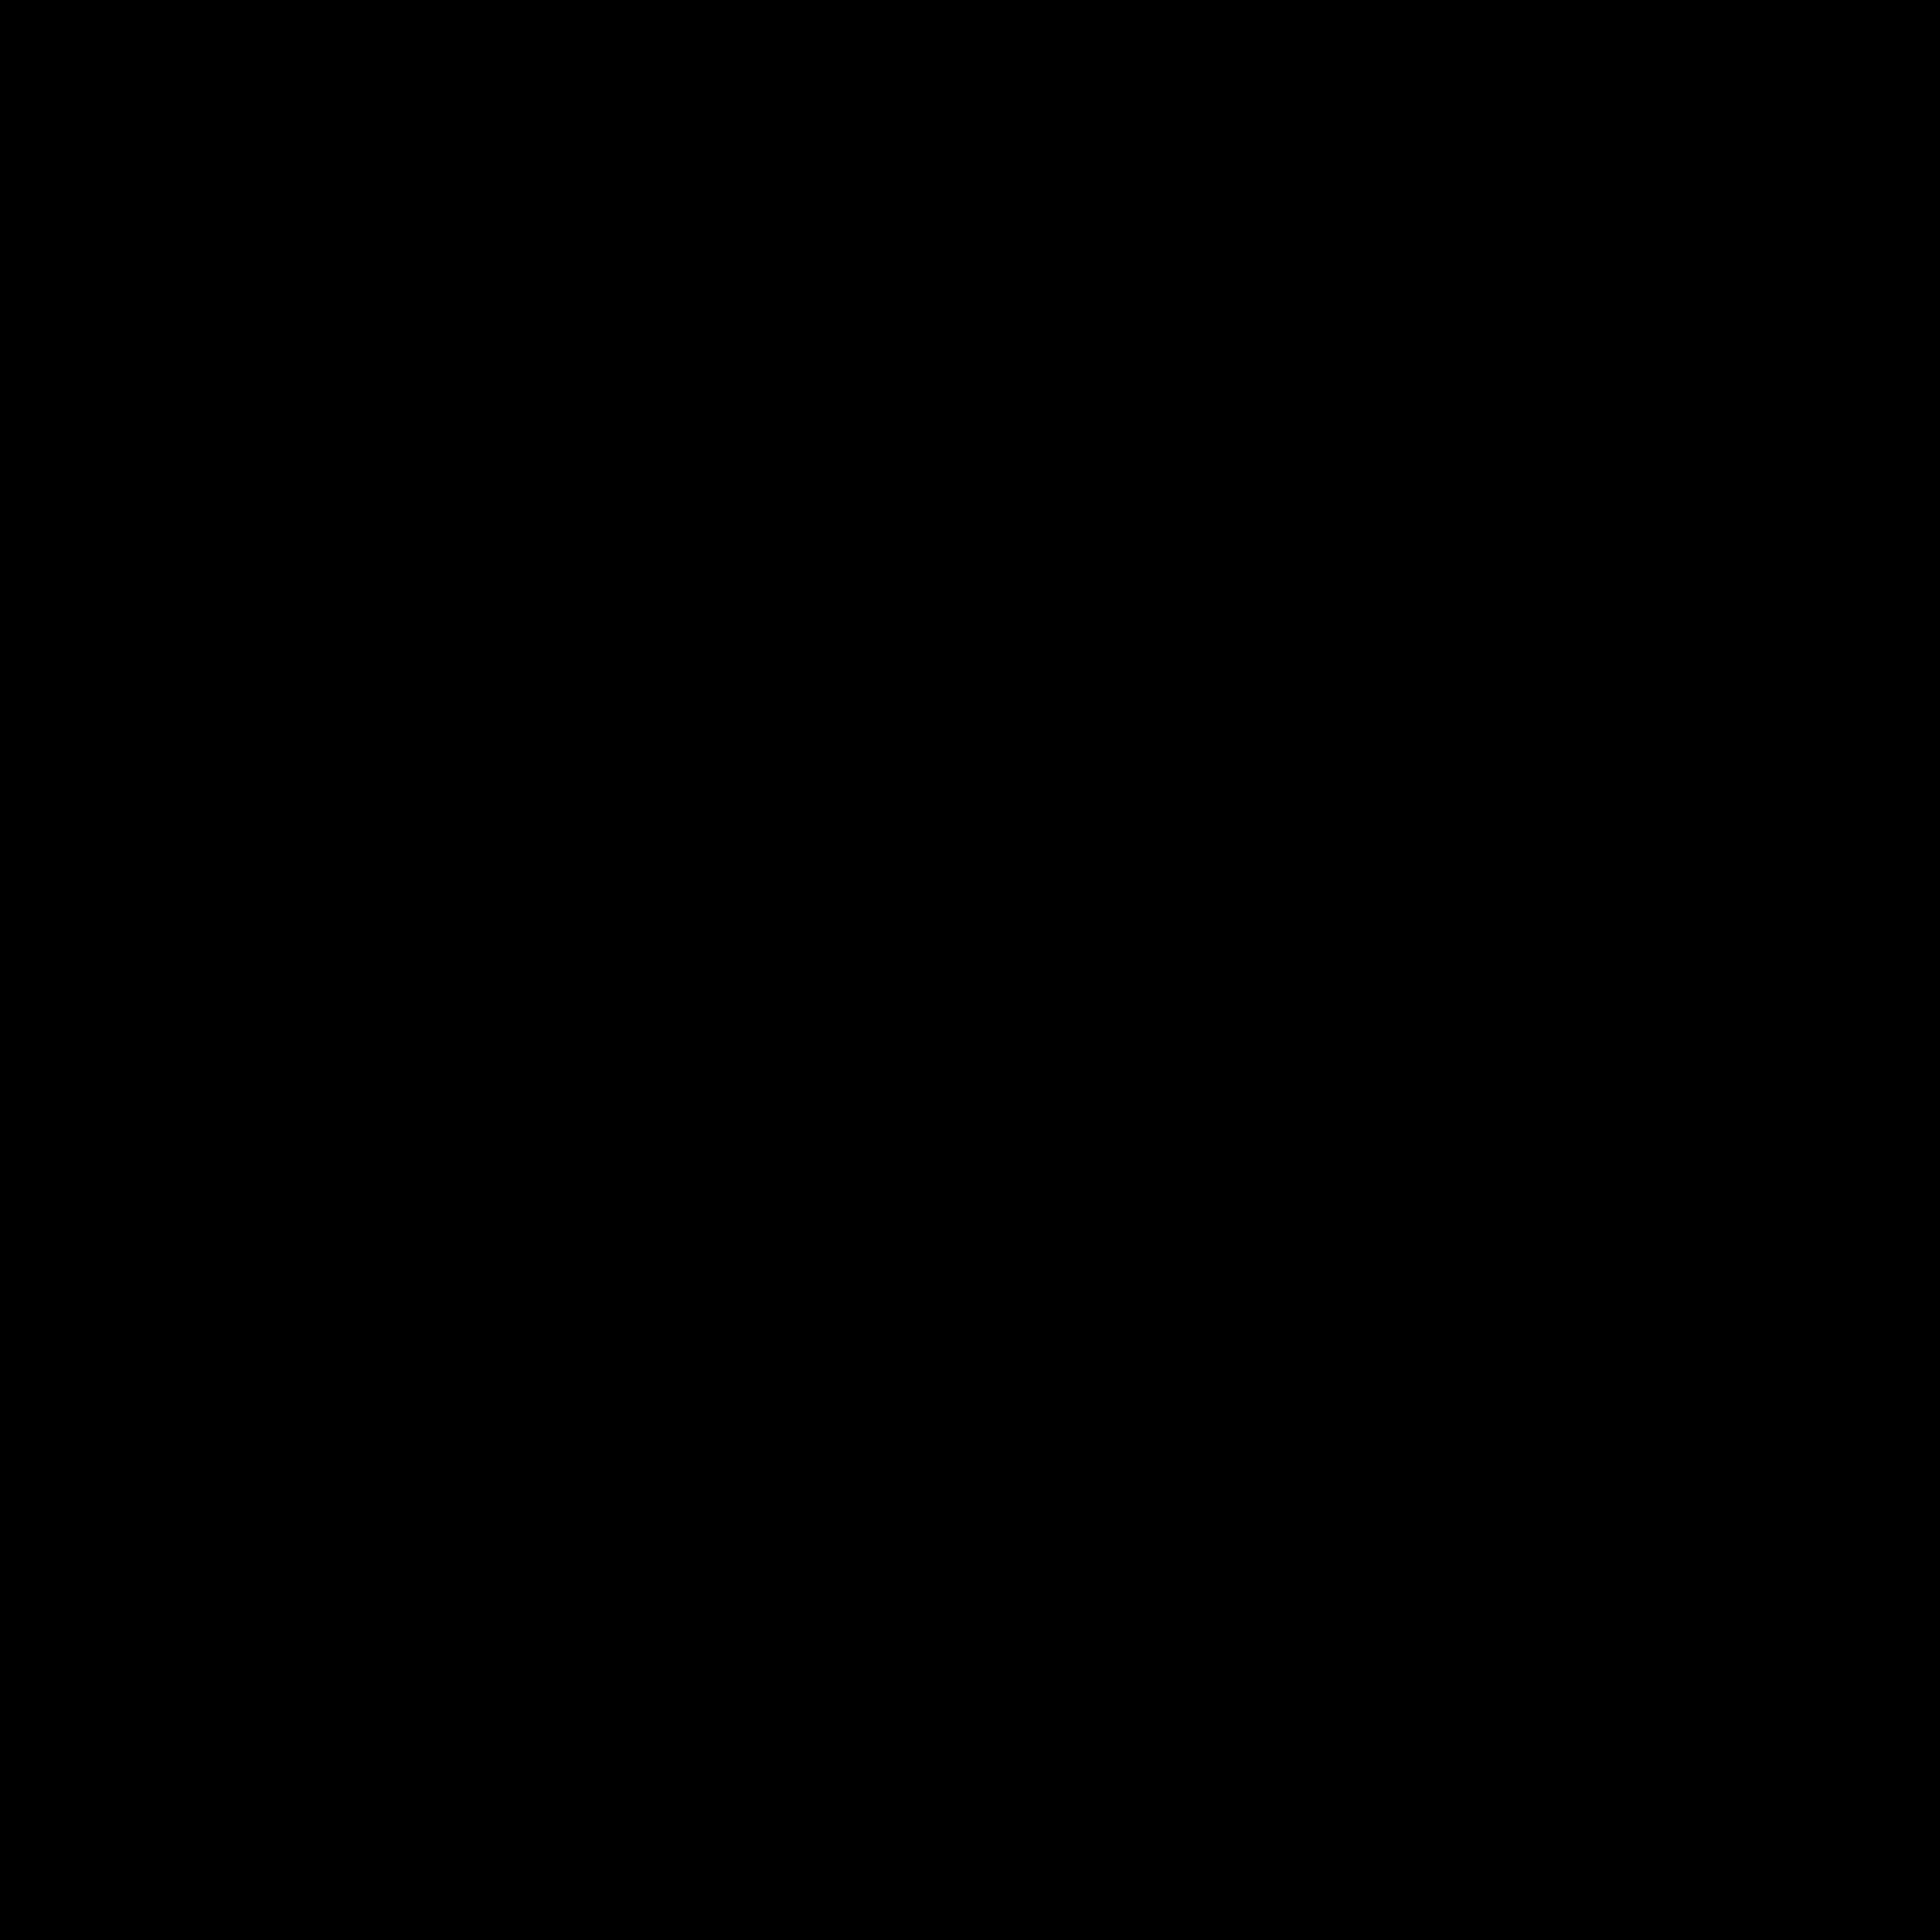 Logotipo de la ADA